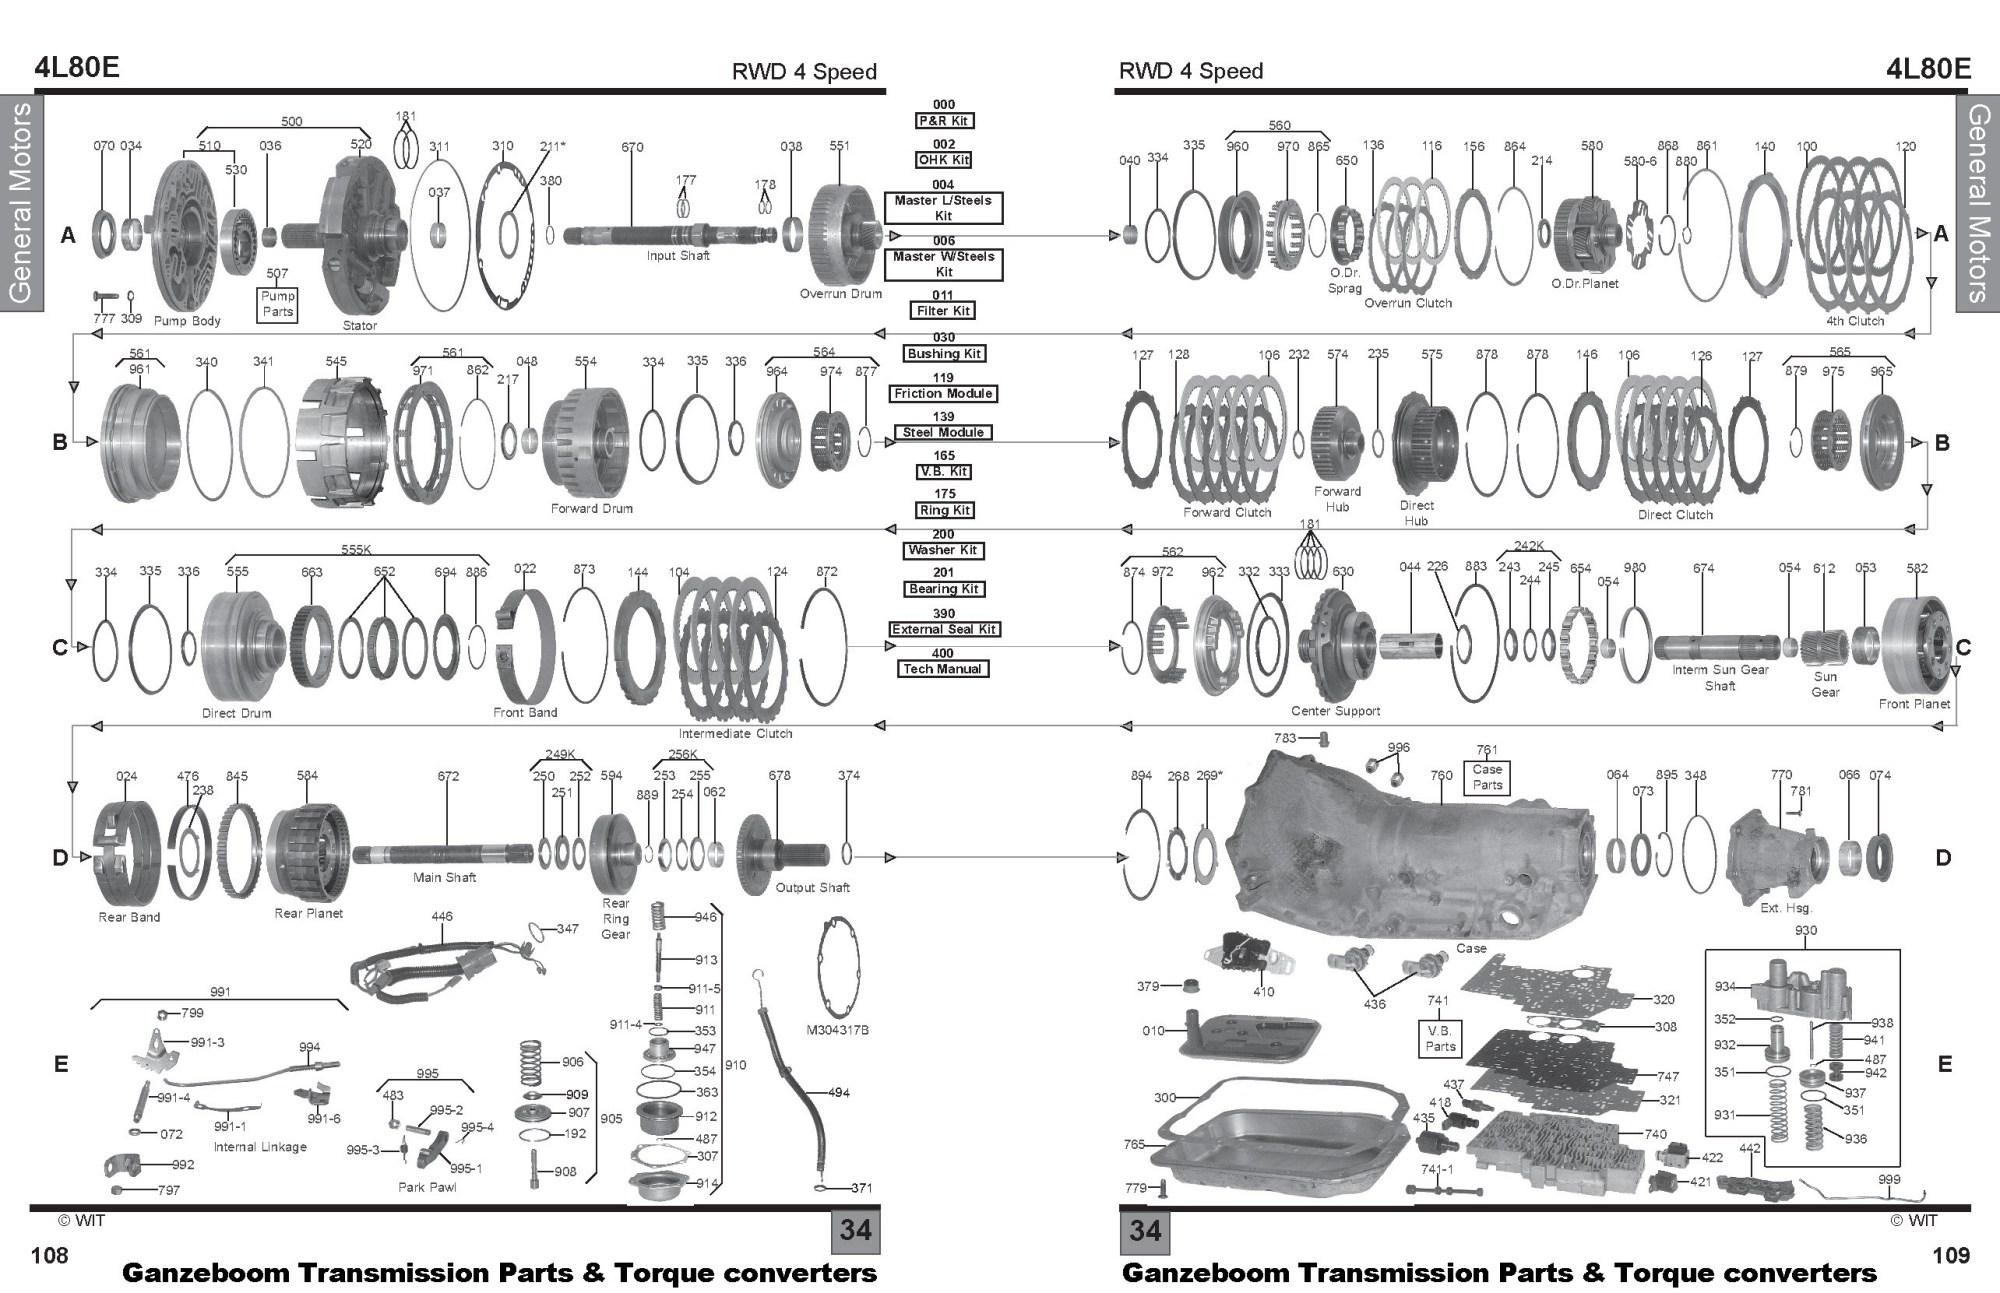 hight resolution of 4l80e transmission rebuild diagram wiring diagrams my 4l80e blow up diagram wiring diagram experts 4l80e transmission